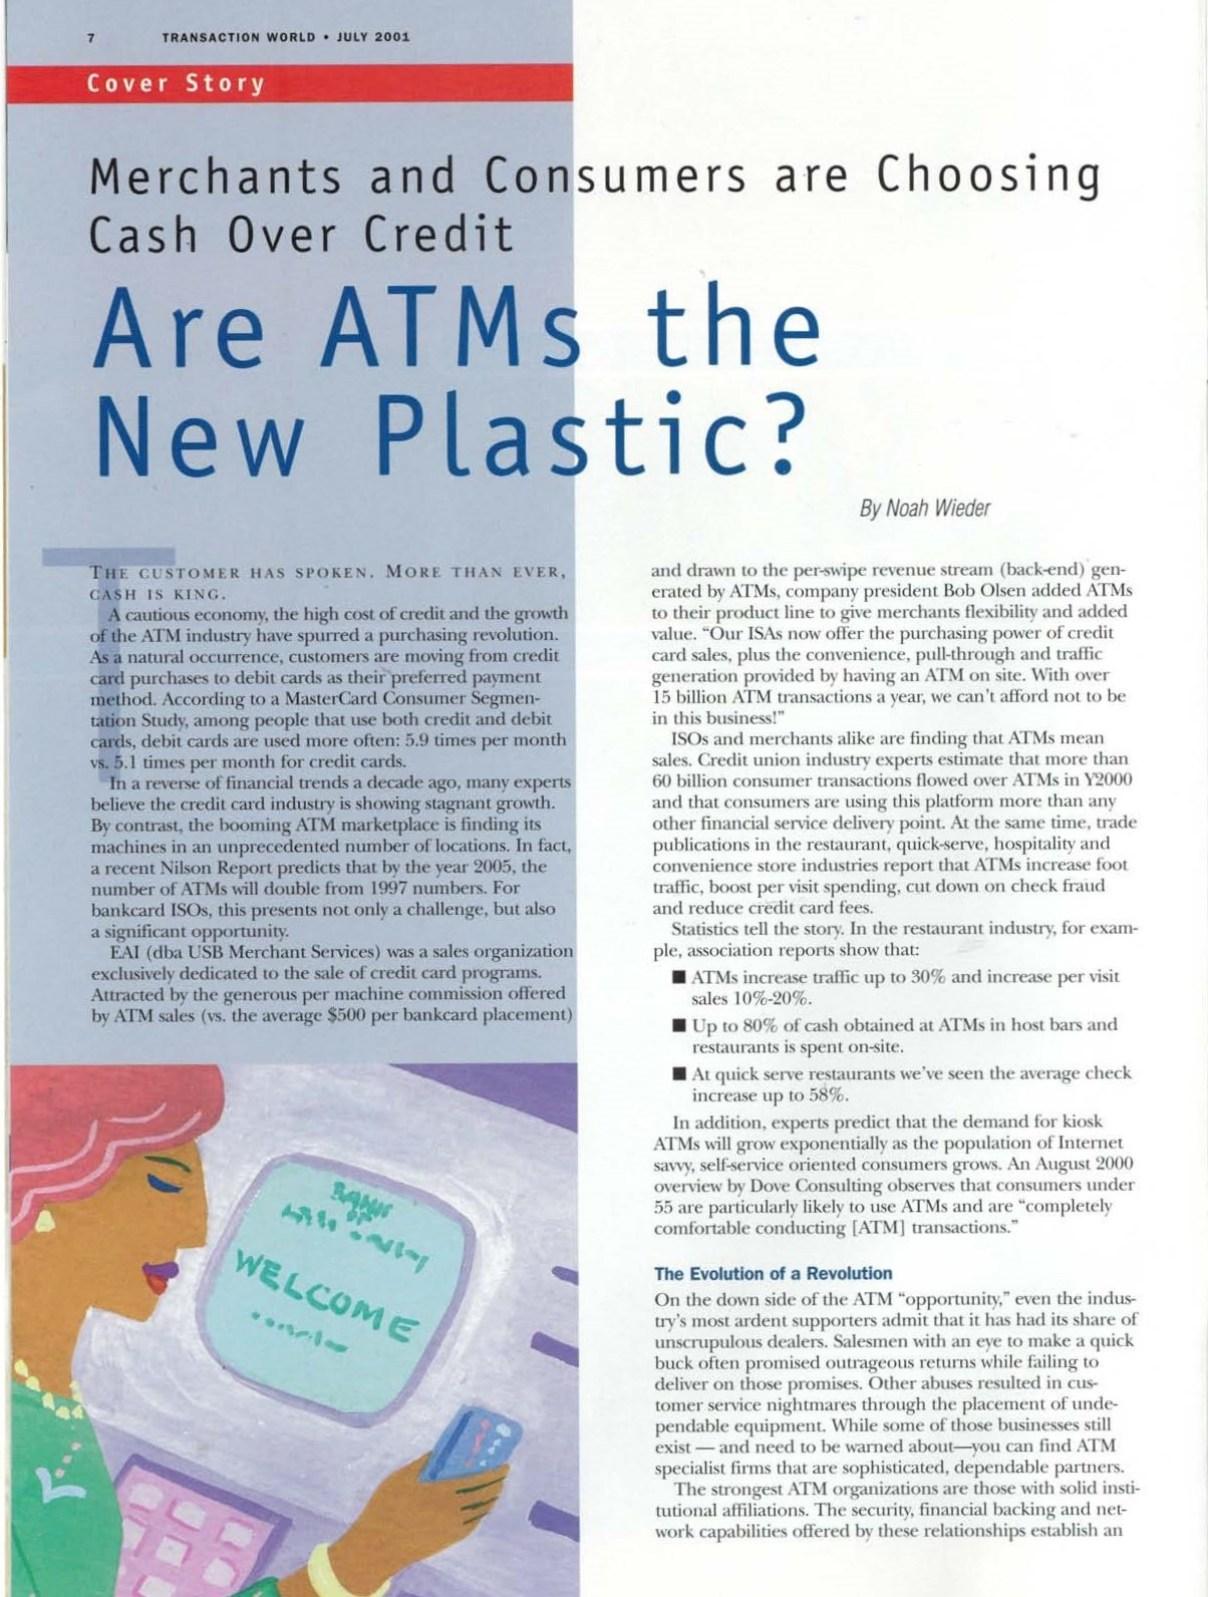 Transaction World Magazine Volume 1, Issue 6, 2001 page 7